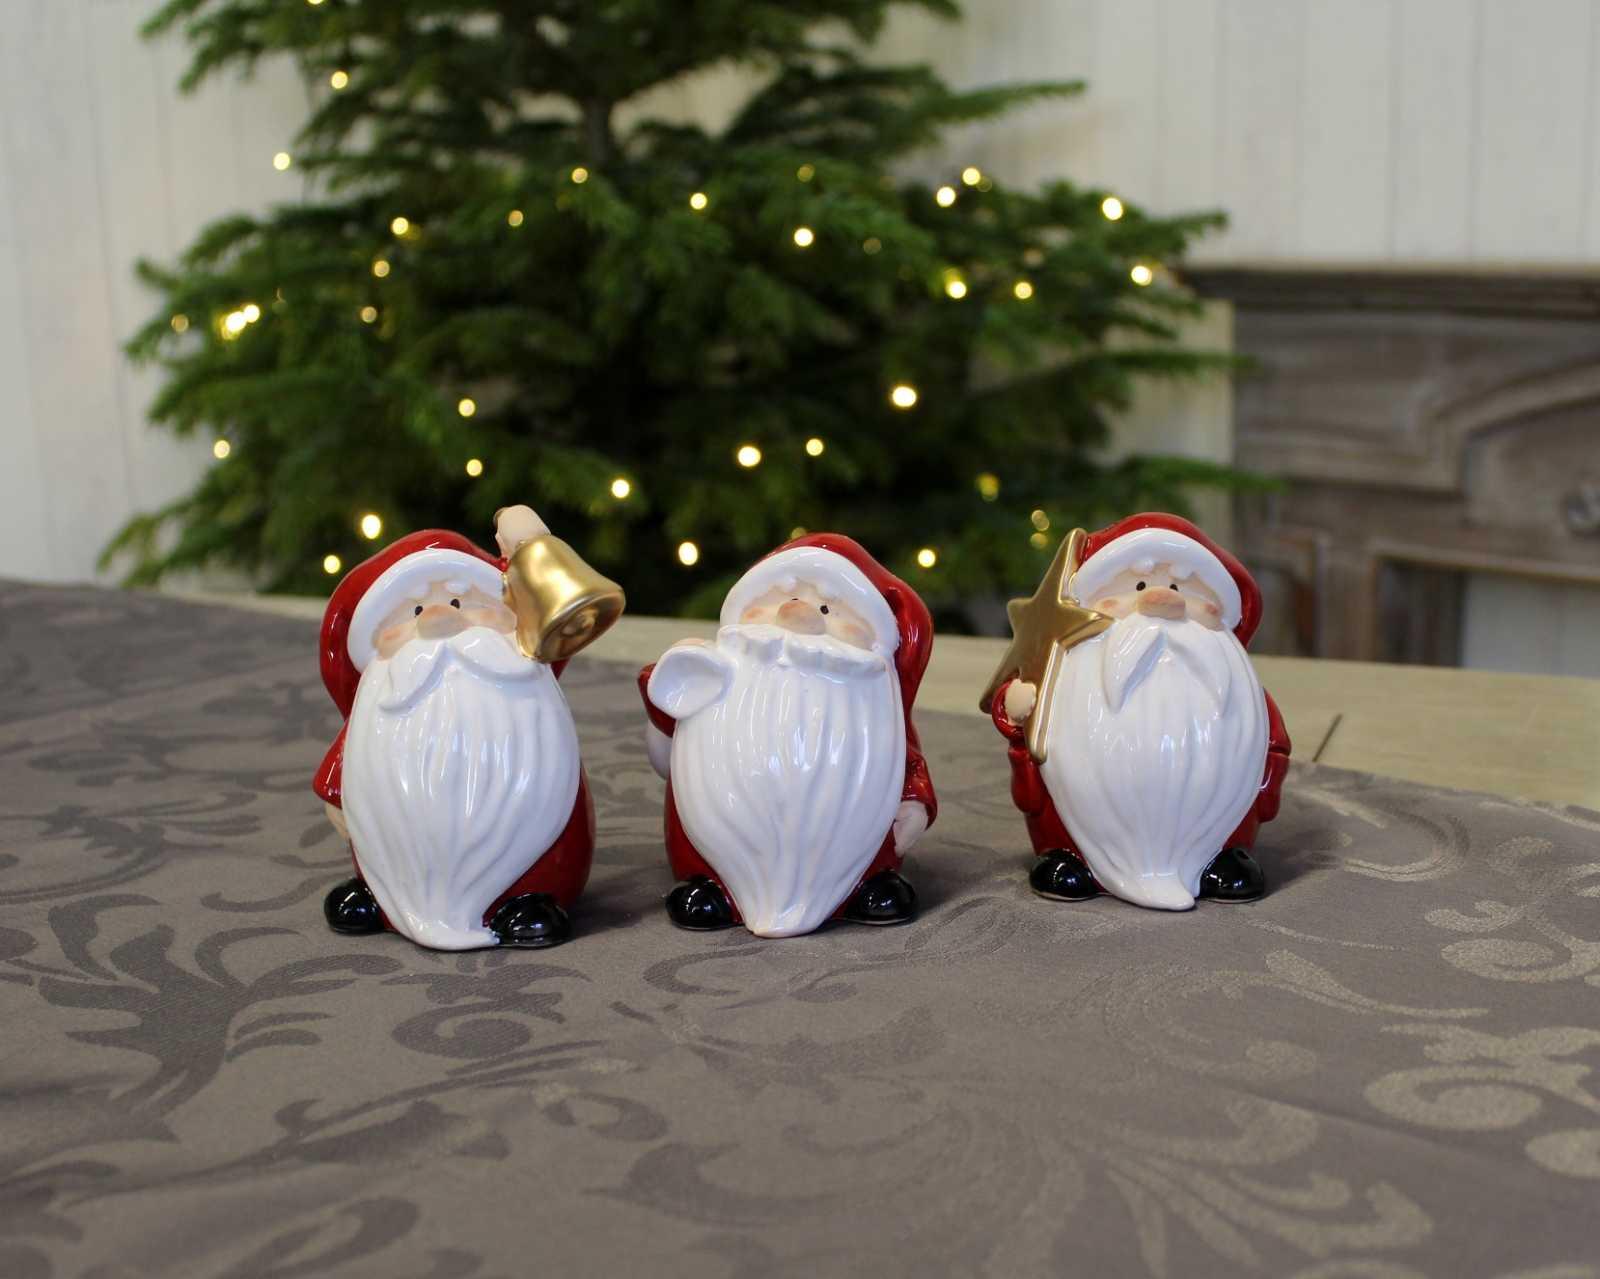 Онлайн каталог PROMENU: Cтатуэтка Санта-Клауса Goldbach, 8х7х11 см, красный, в ассортименте Goldbach 64 2333